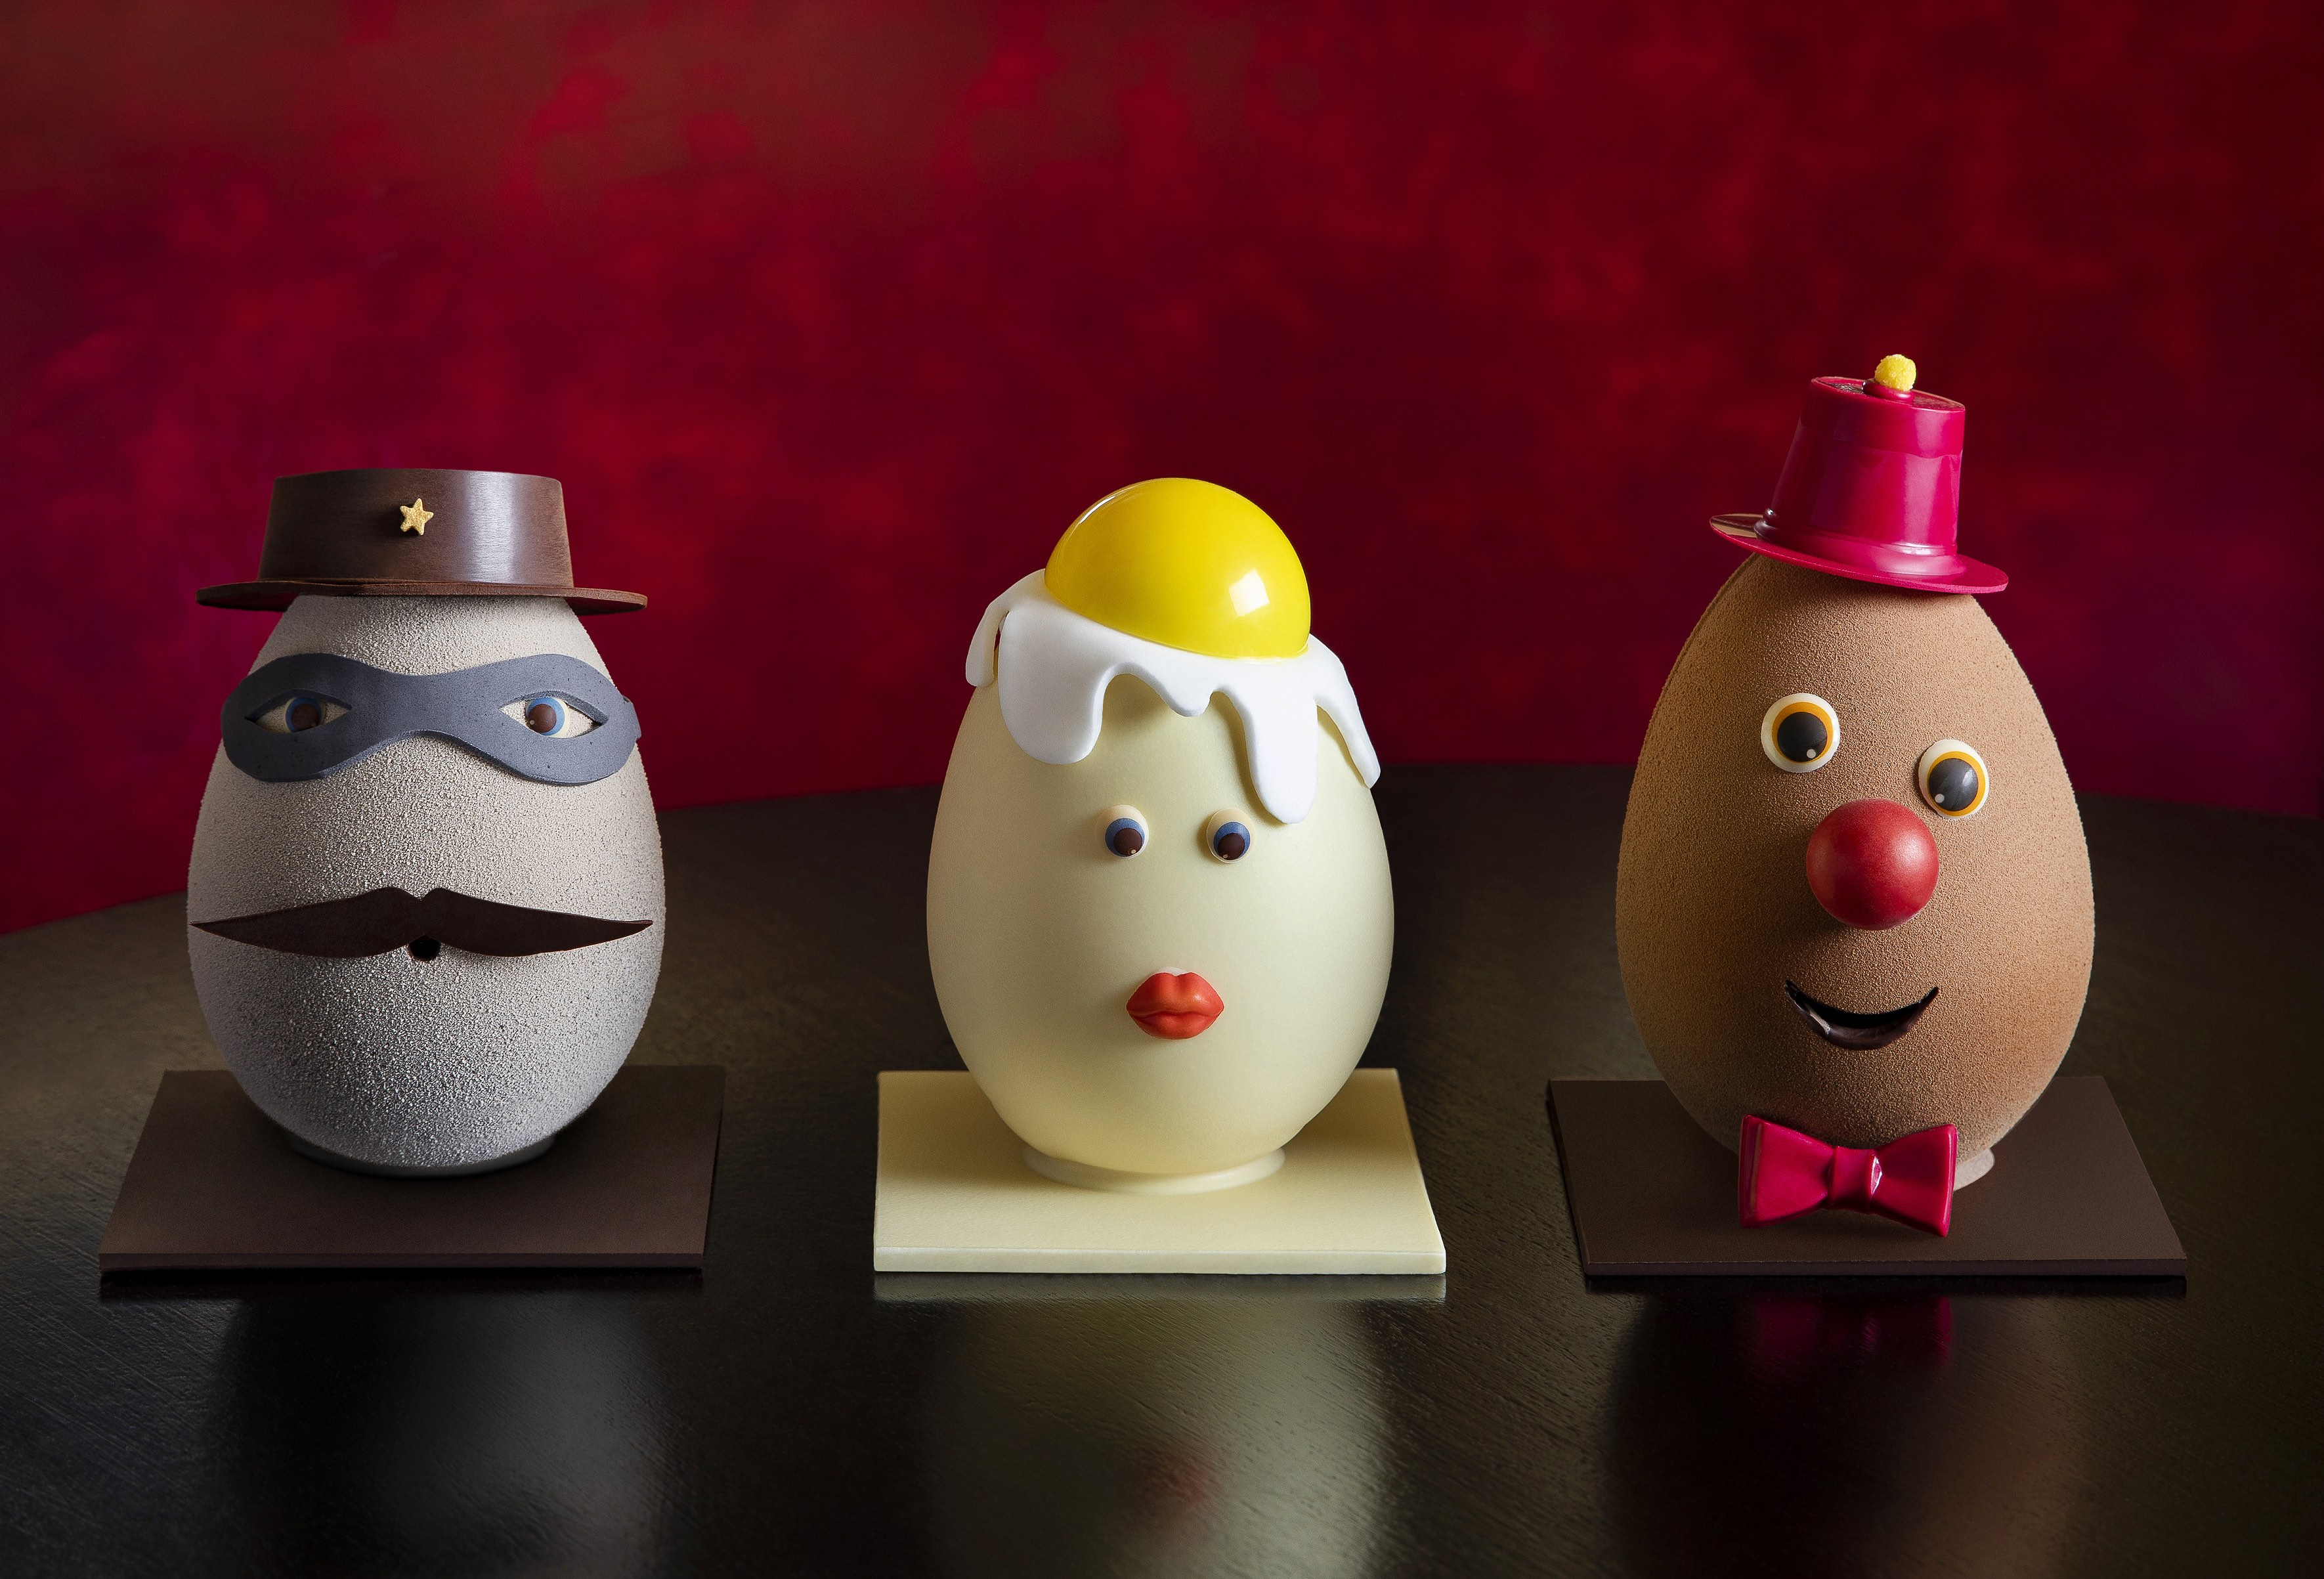 balthazar easter eggs, best Easter food in London, Easter food in London, Easter food London